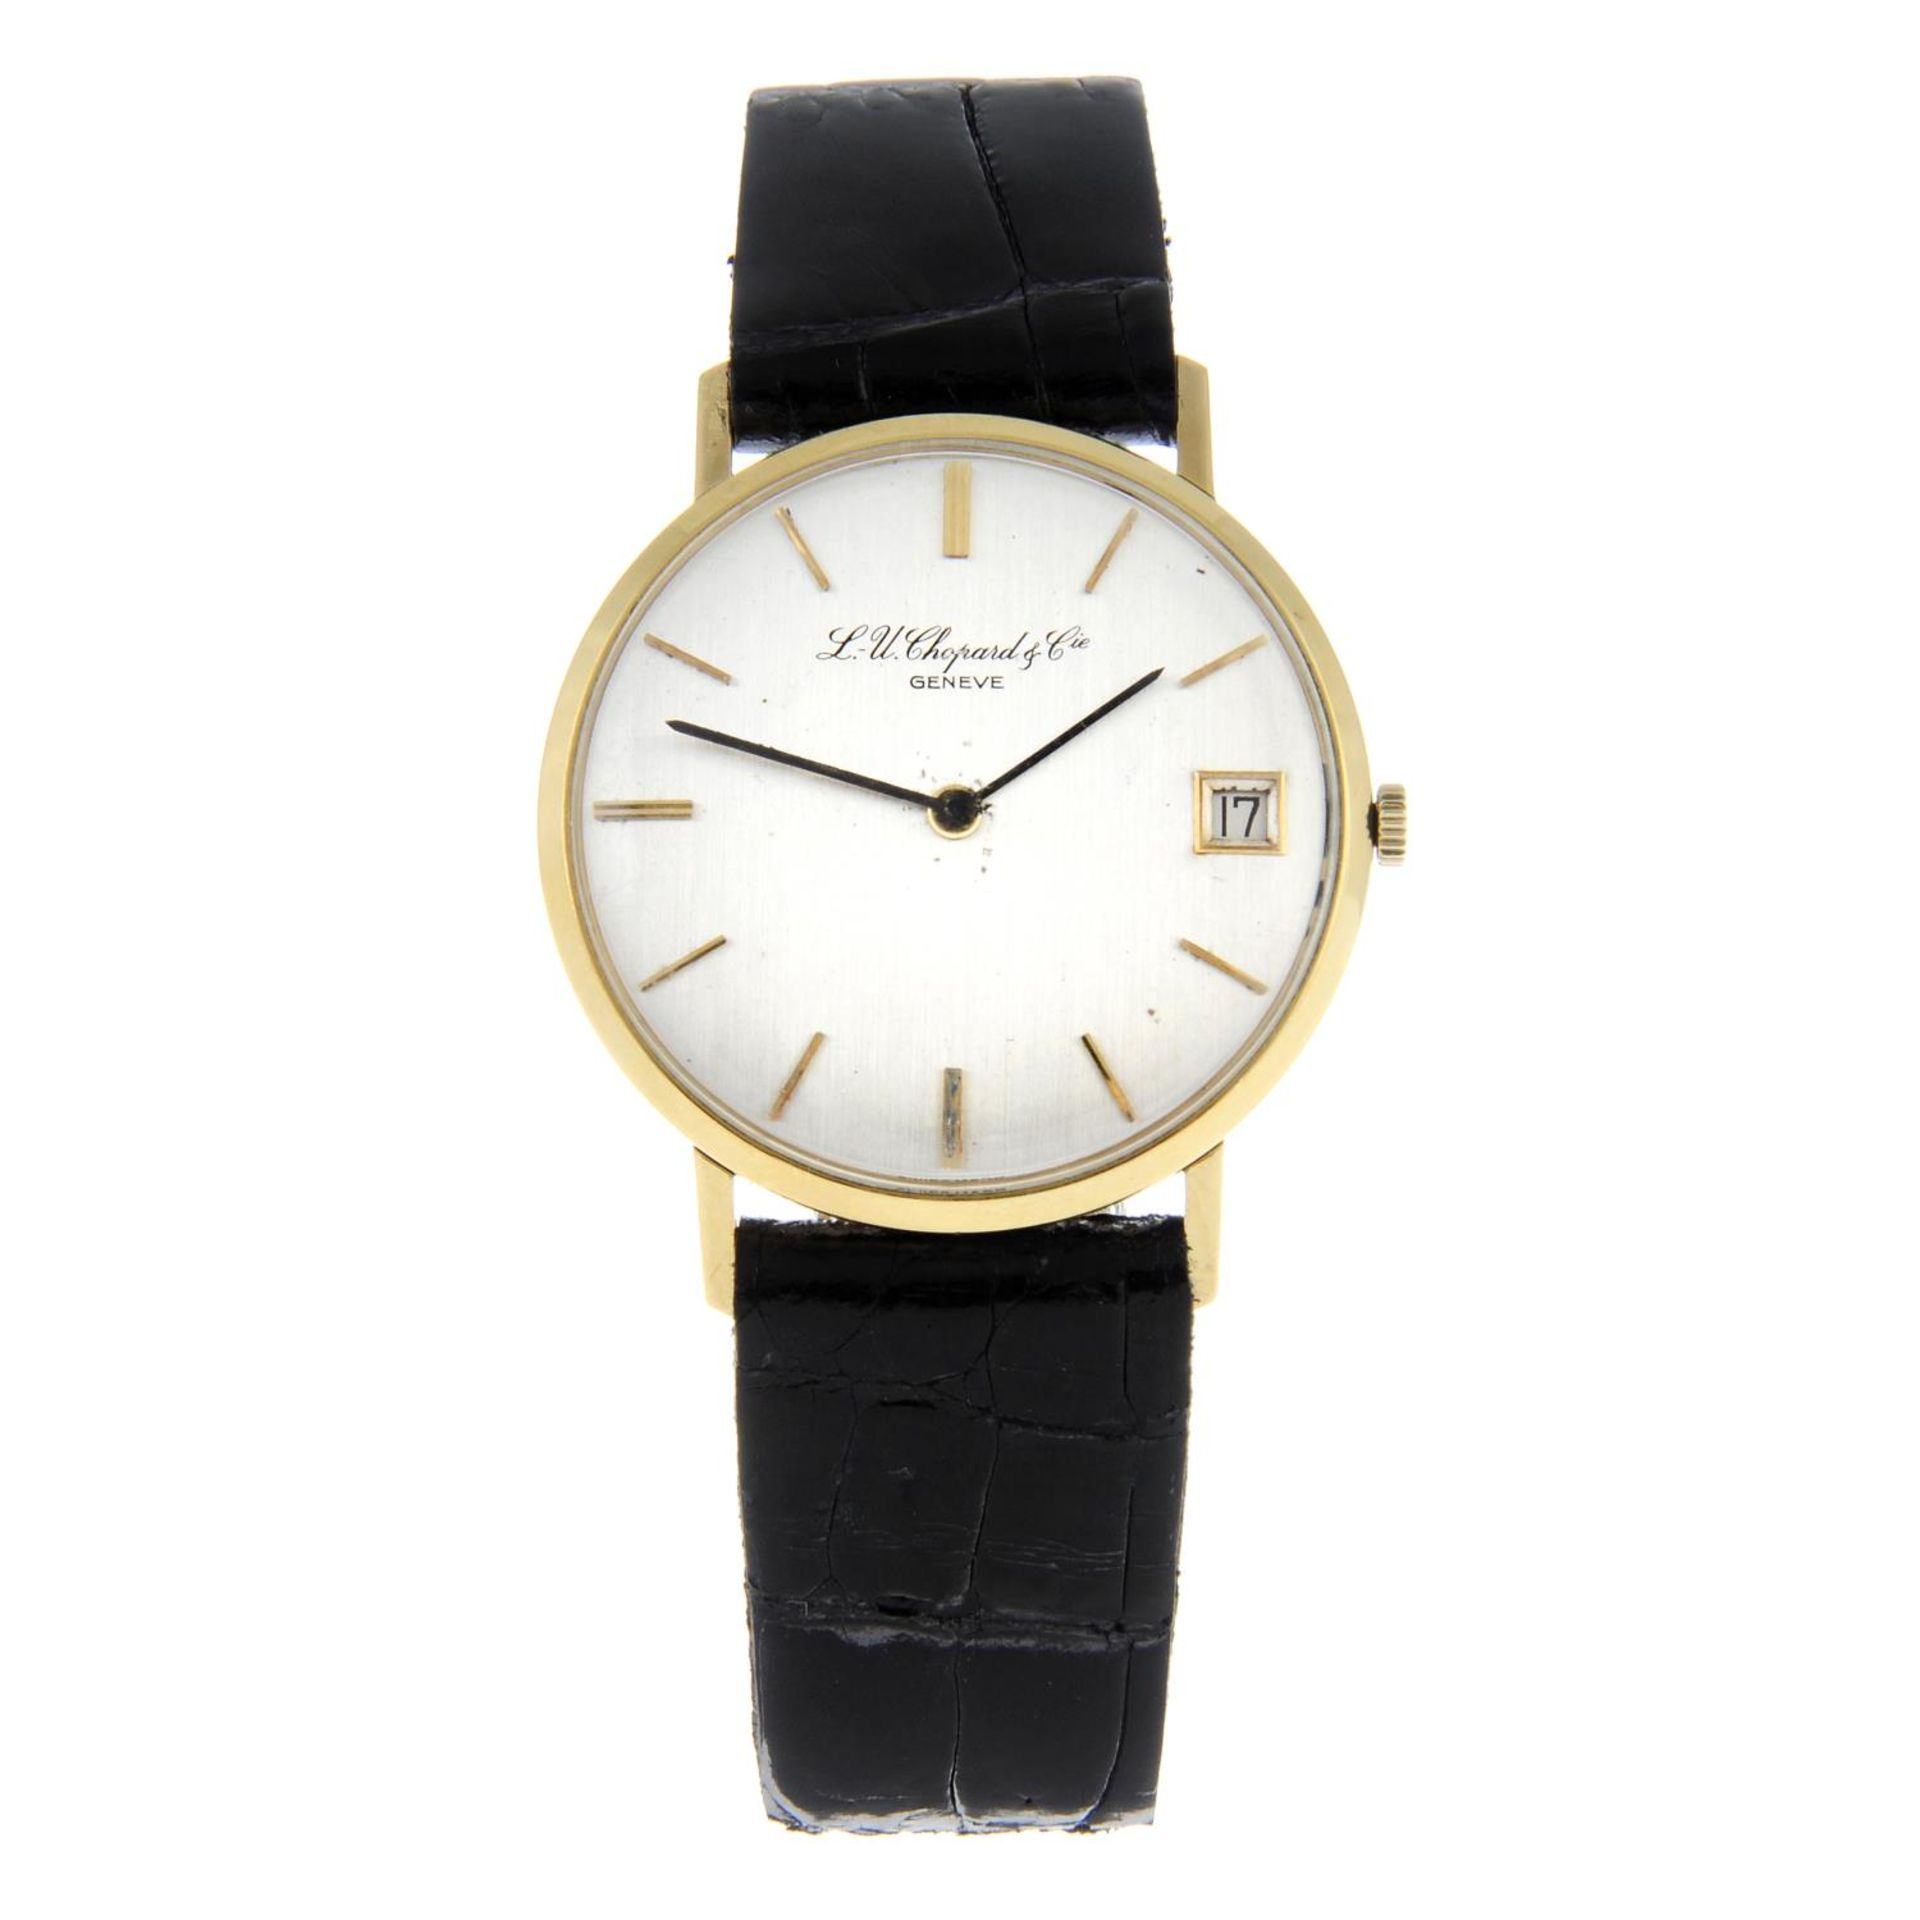 CHOPARD - a wrist watch.